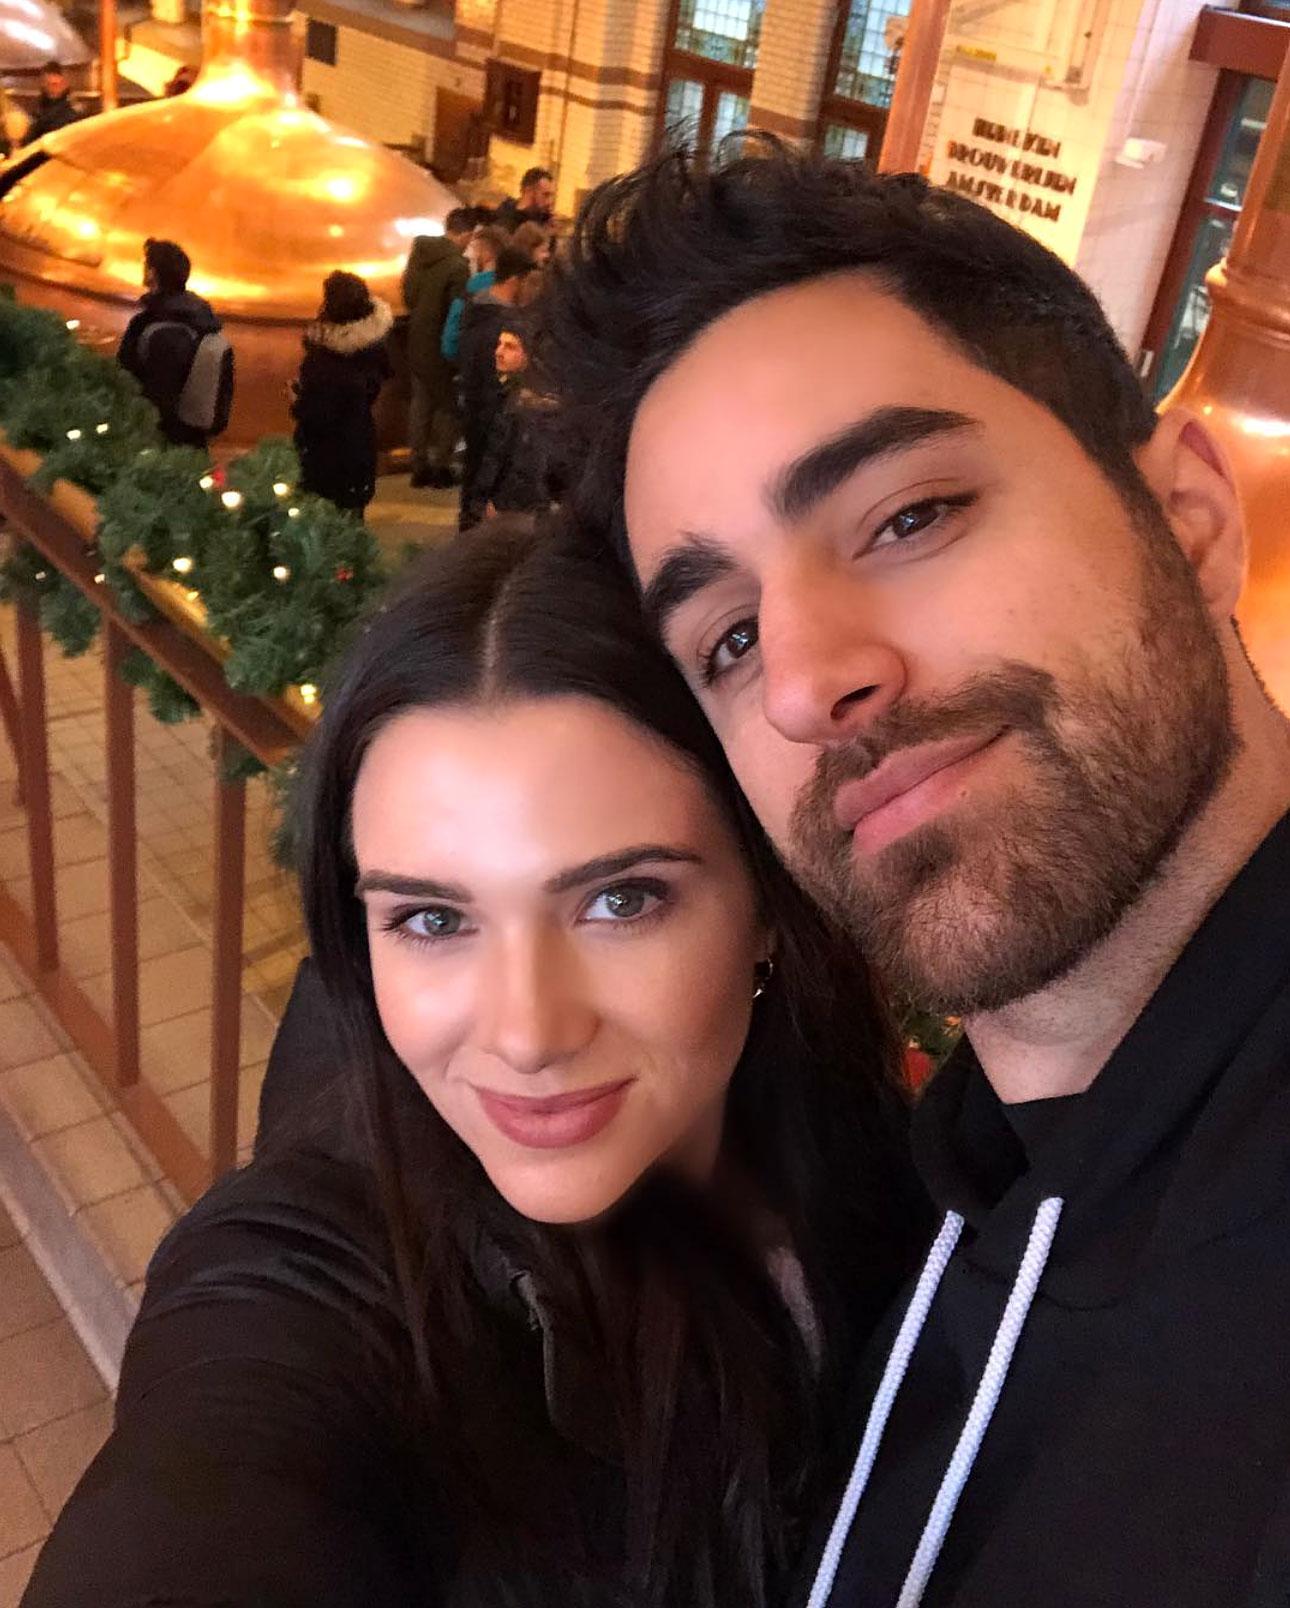 Katie-Stevens-and-Boyfriend-Paul-DiGiova